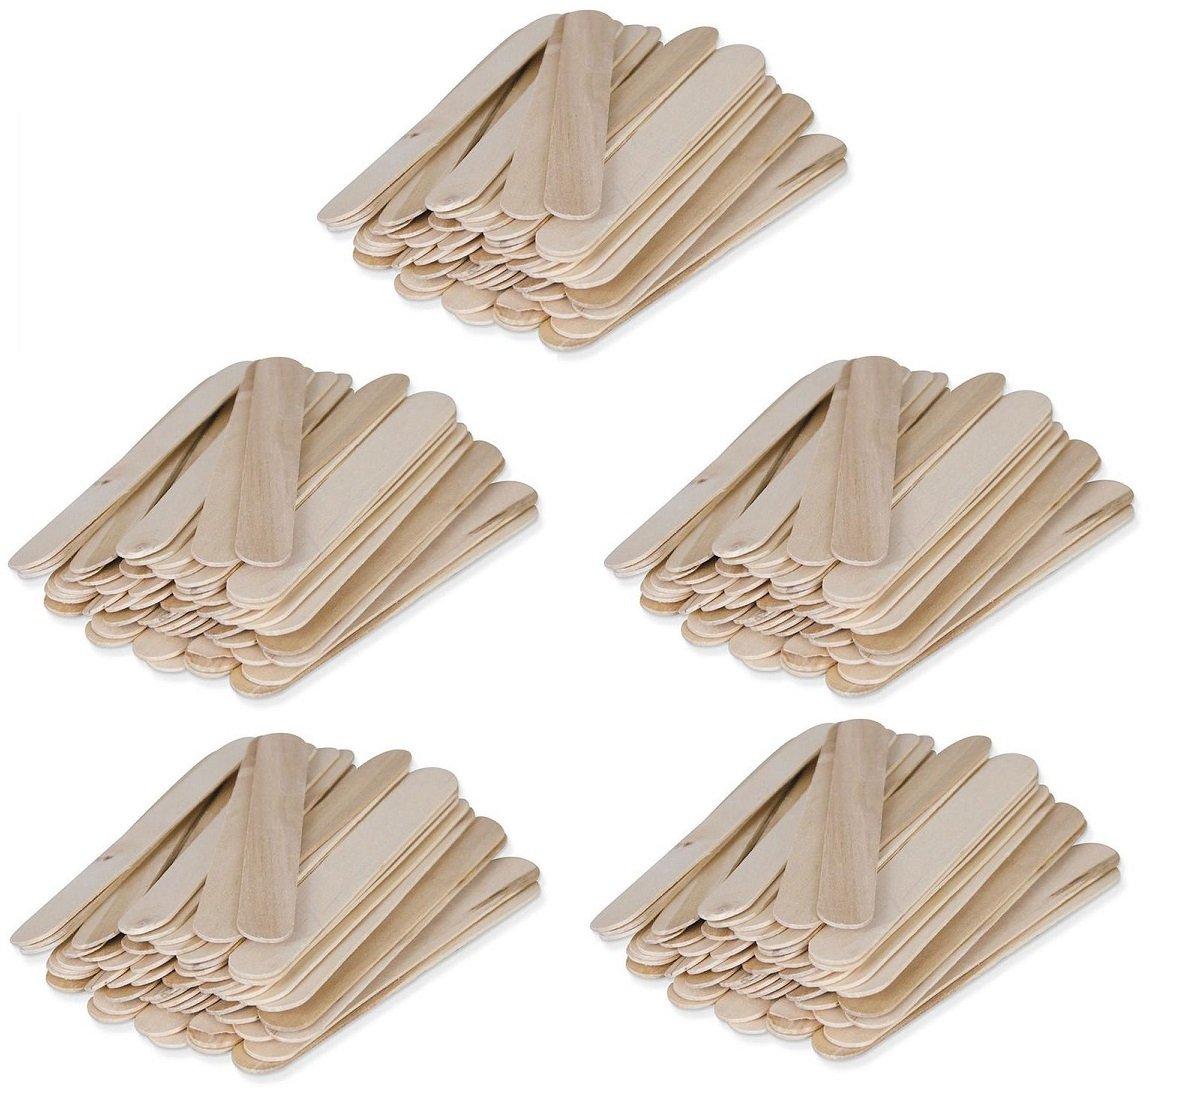 Large Wood 5 7/8 x 11/16 Wax Applicator Stick 250ct WW-W150A (5 Pack of 50ct)